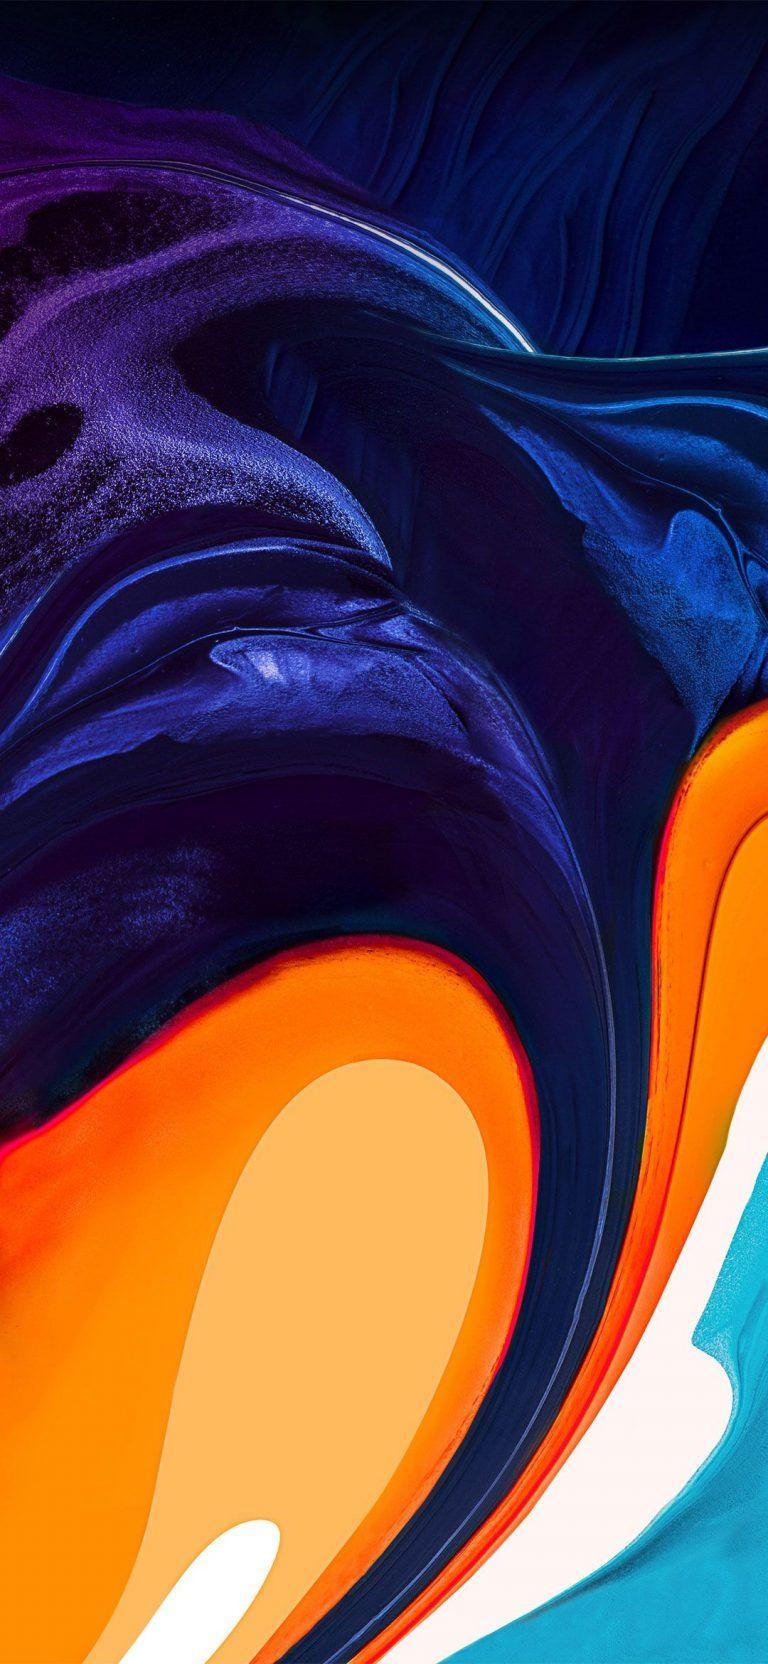 Pin By Roel Kabigting On Sfondi Hd Phone Wallpapers Samsung Wallpaper Mkbhd Wallpapers